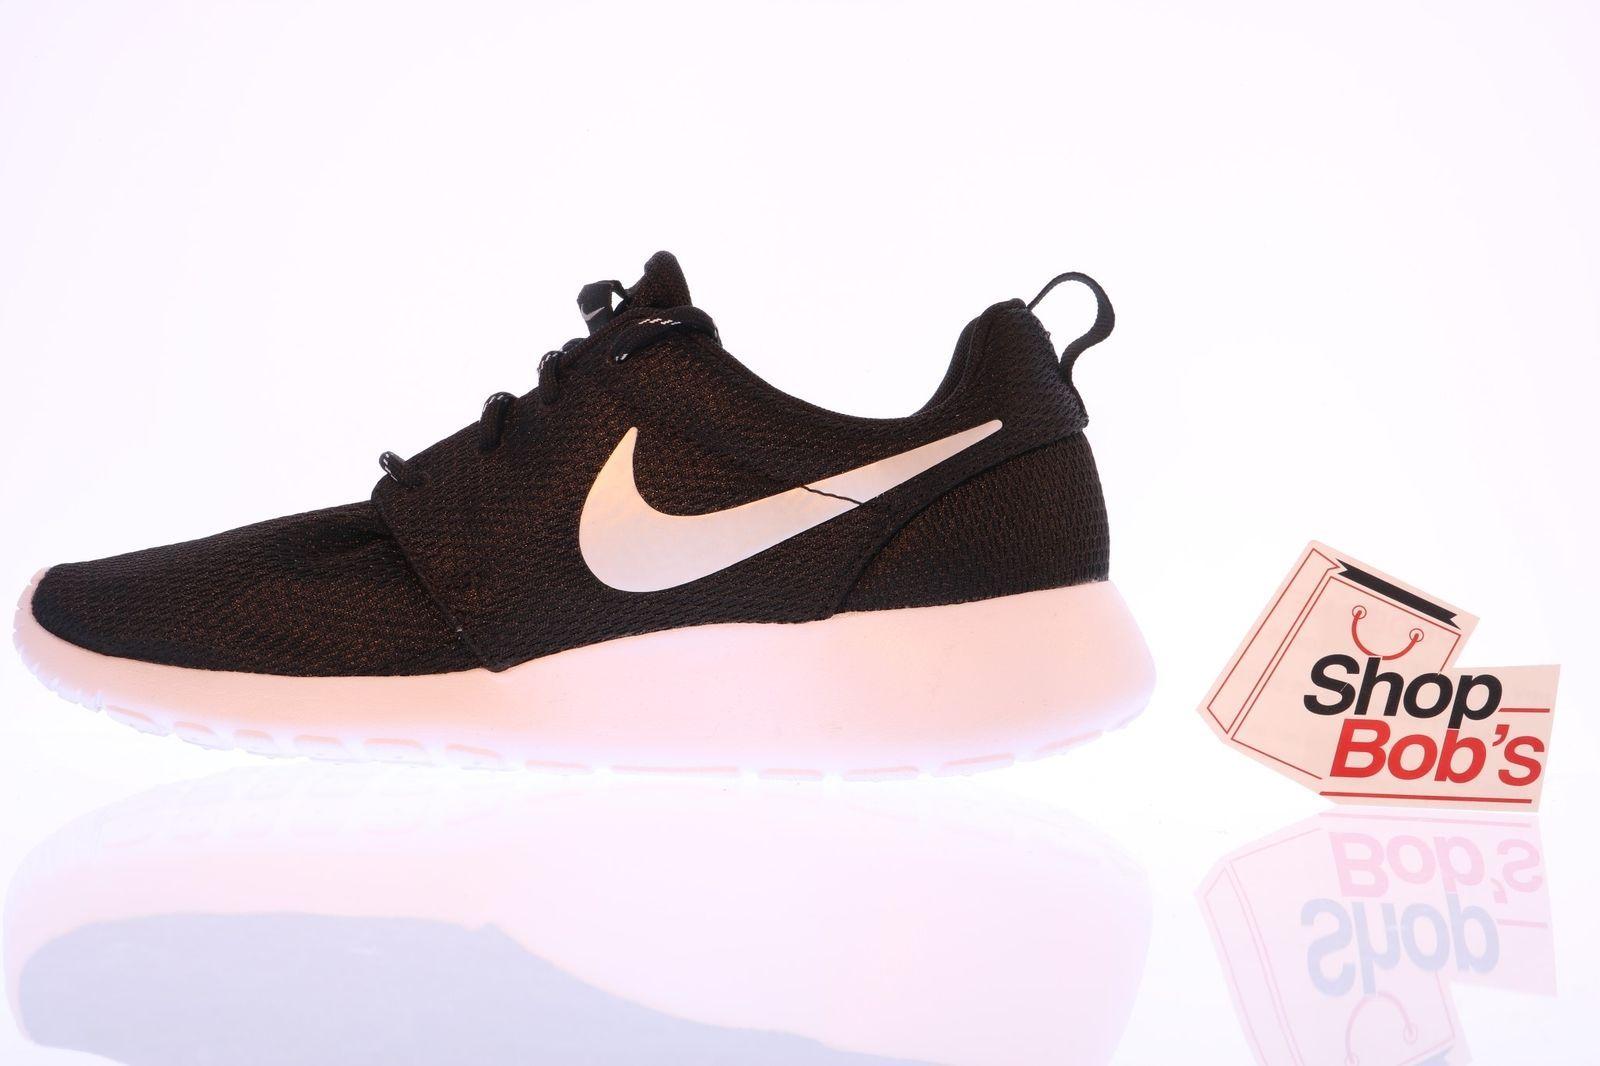 d2dba8ba1a0e ... NEW Nike Women s Roshe Run Black Silver Running Shoes Trainers 511882-094  Sz ...